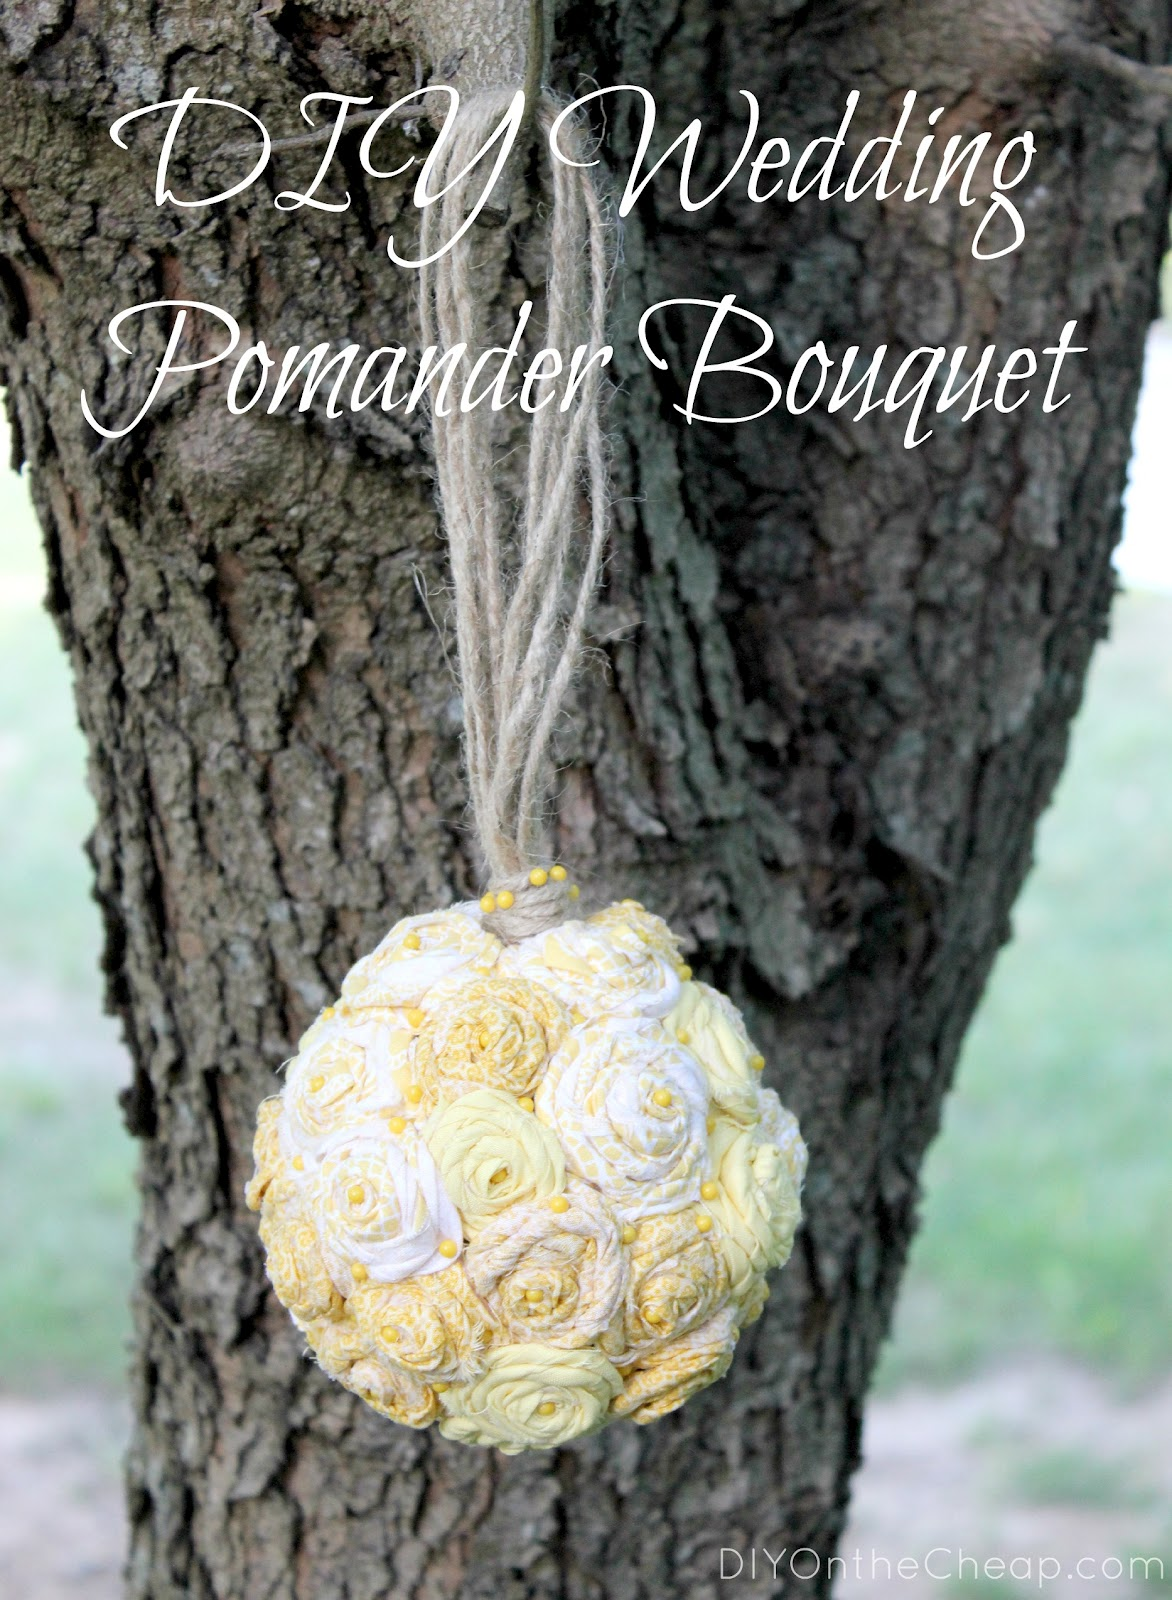 Diy wedding pomander bouquet crafterminds blog hop erin spain diy wedding pomander bouquet crafterminds blog hop izmirmasajfo